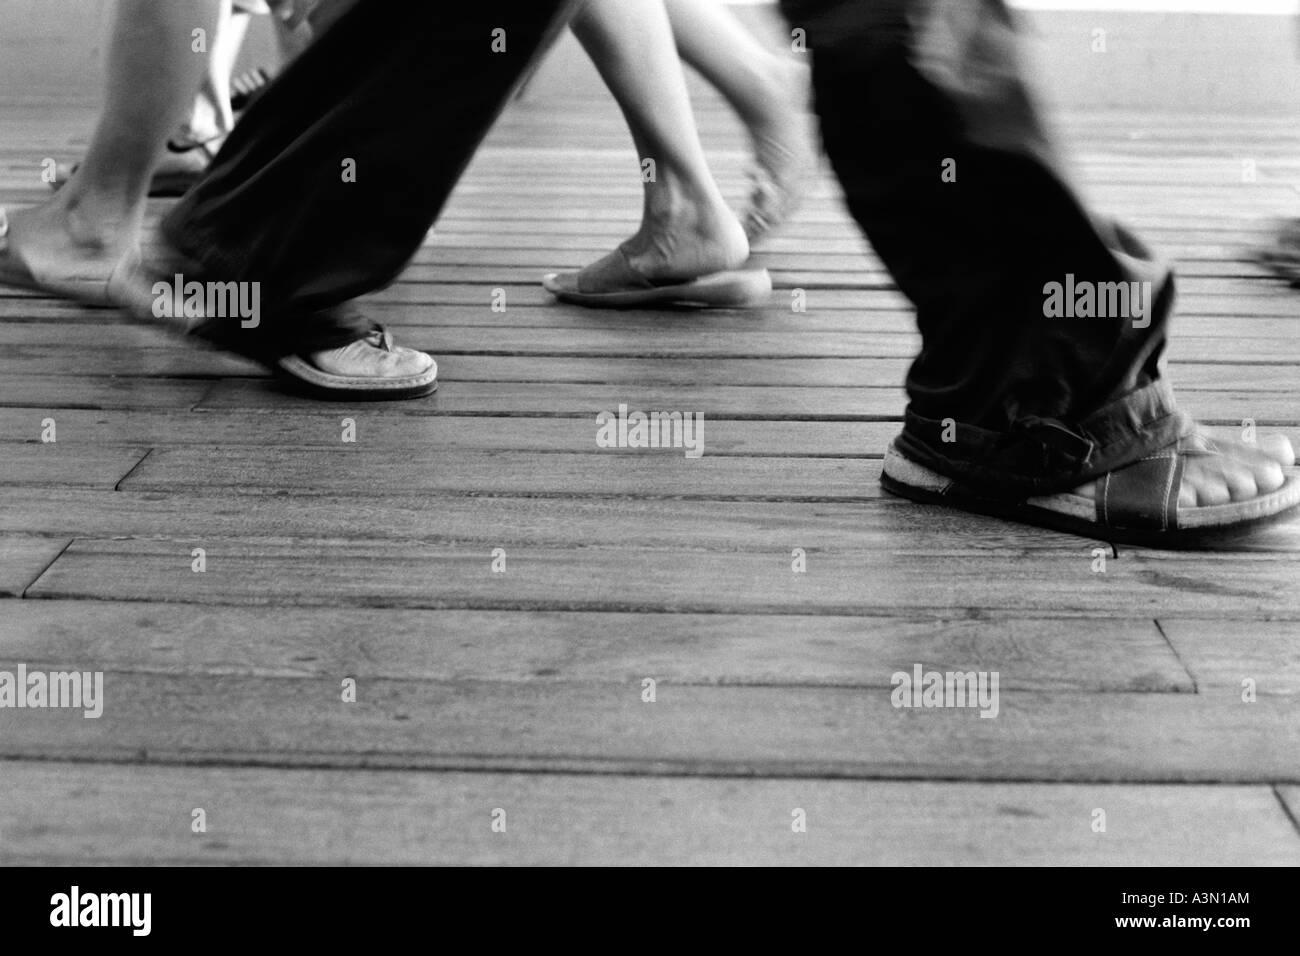 Feet of walking people - Stock Image